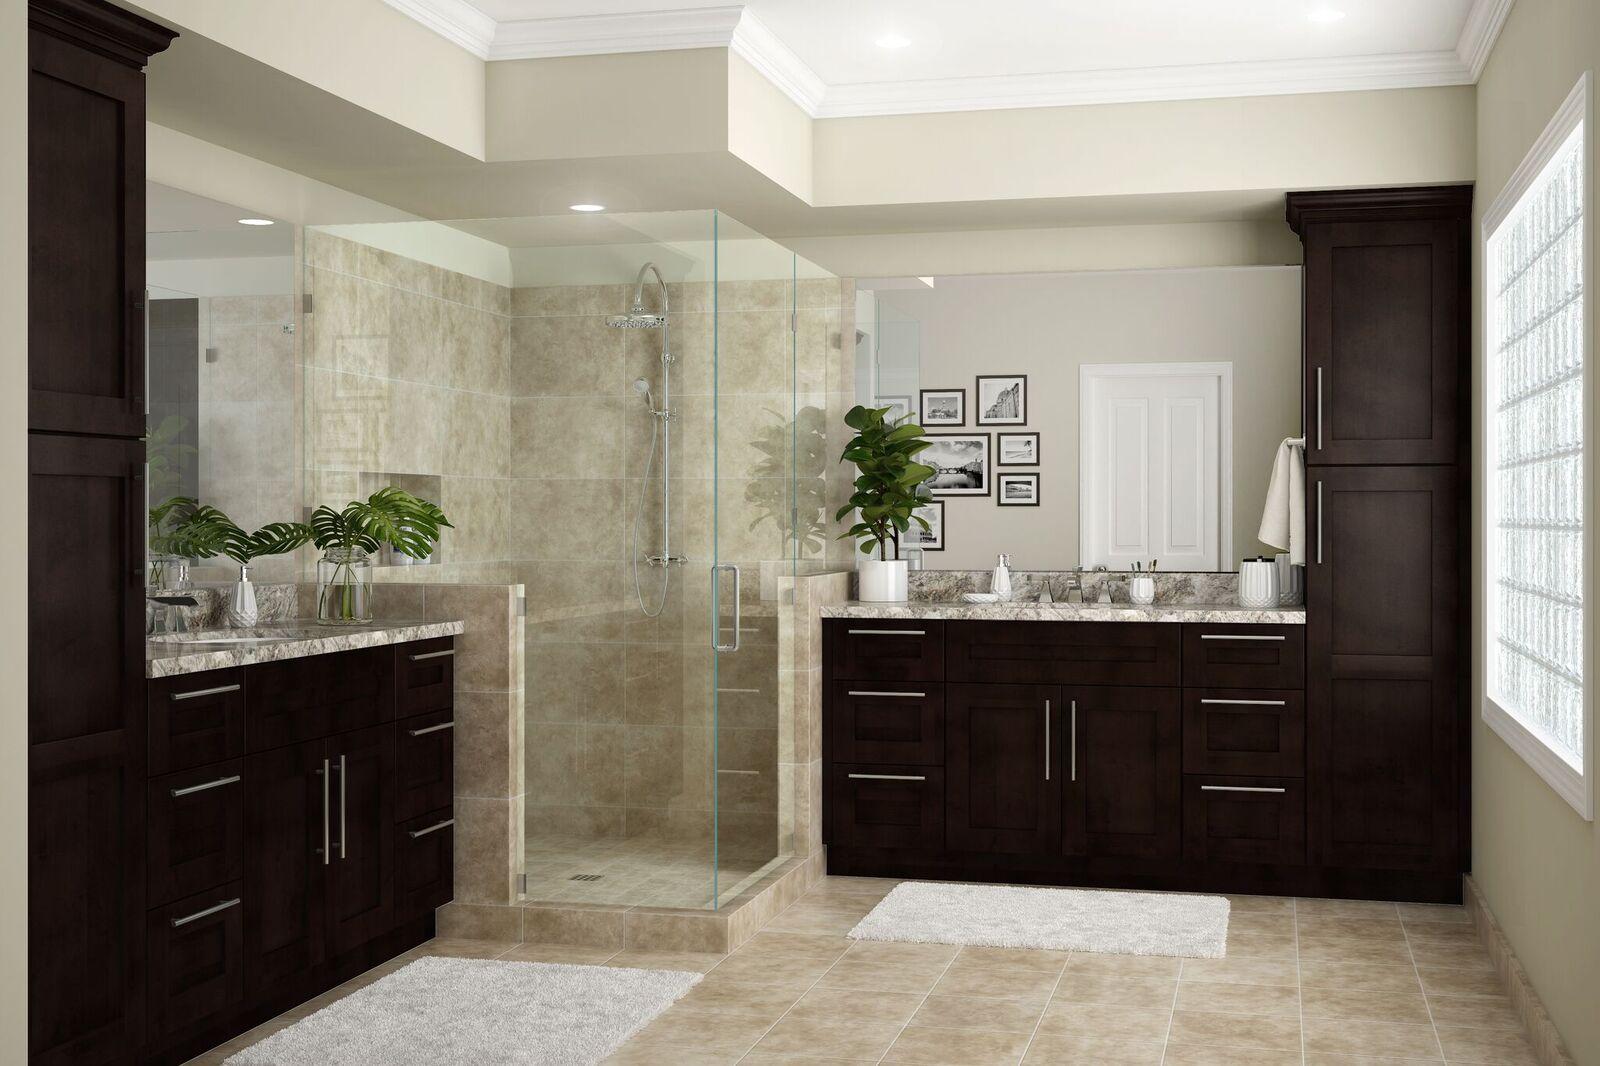 Franklin Bath Cabinets In Manganite